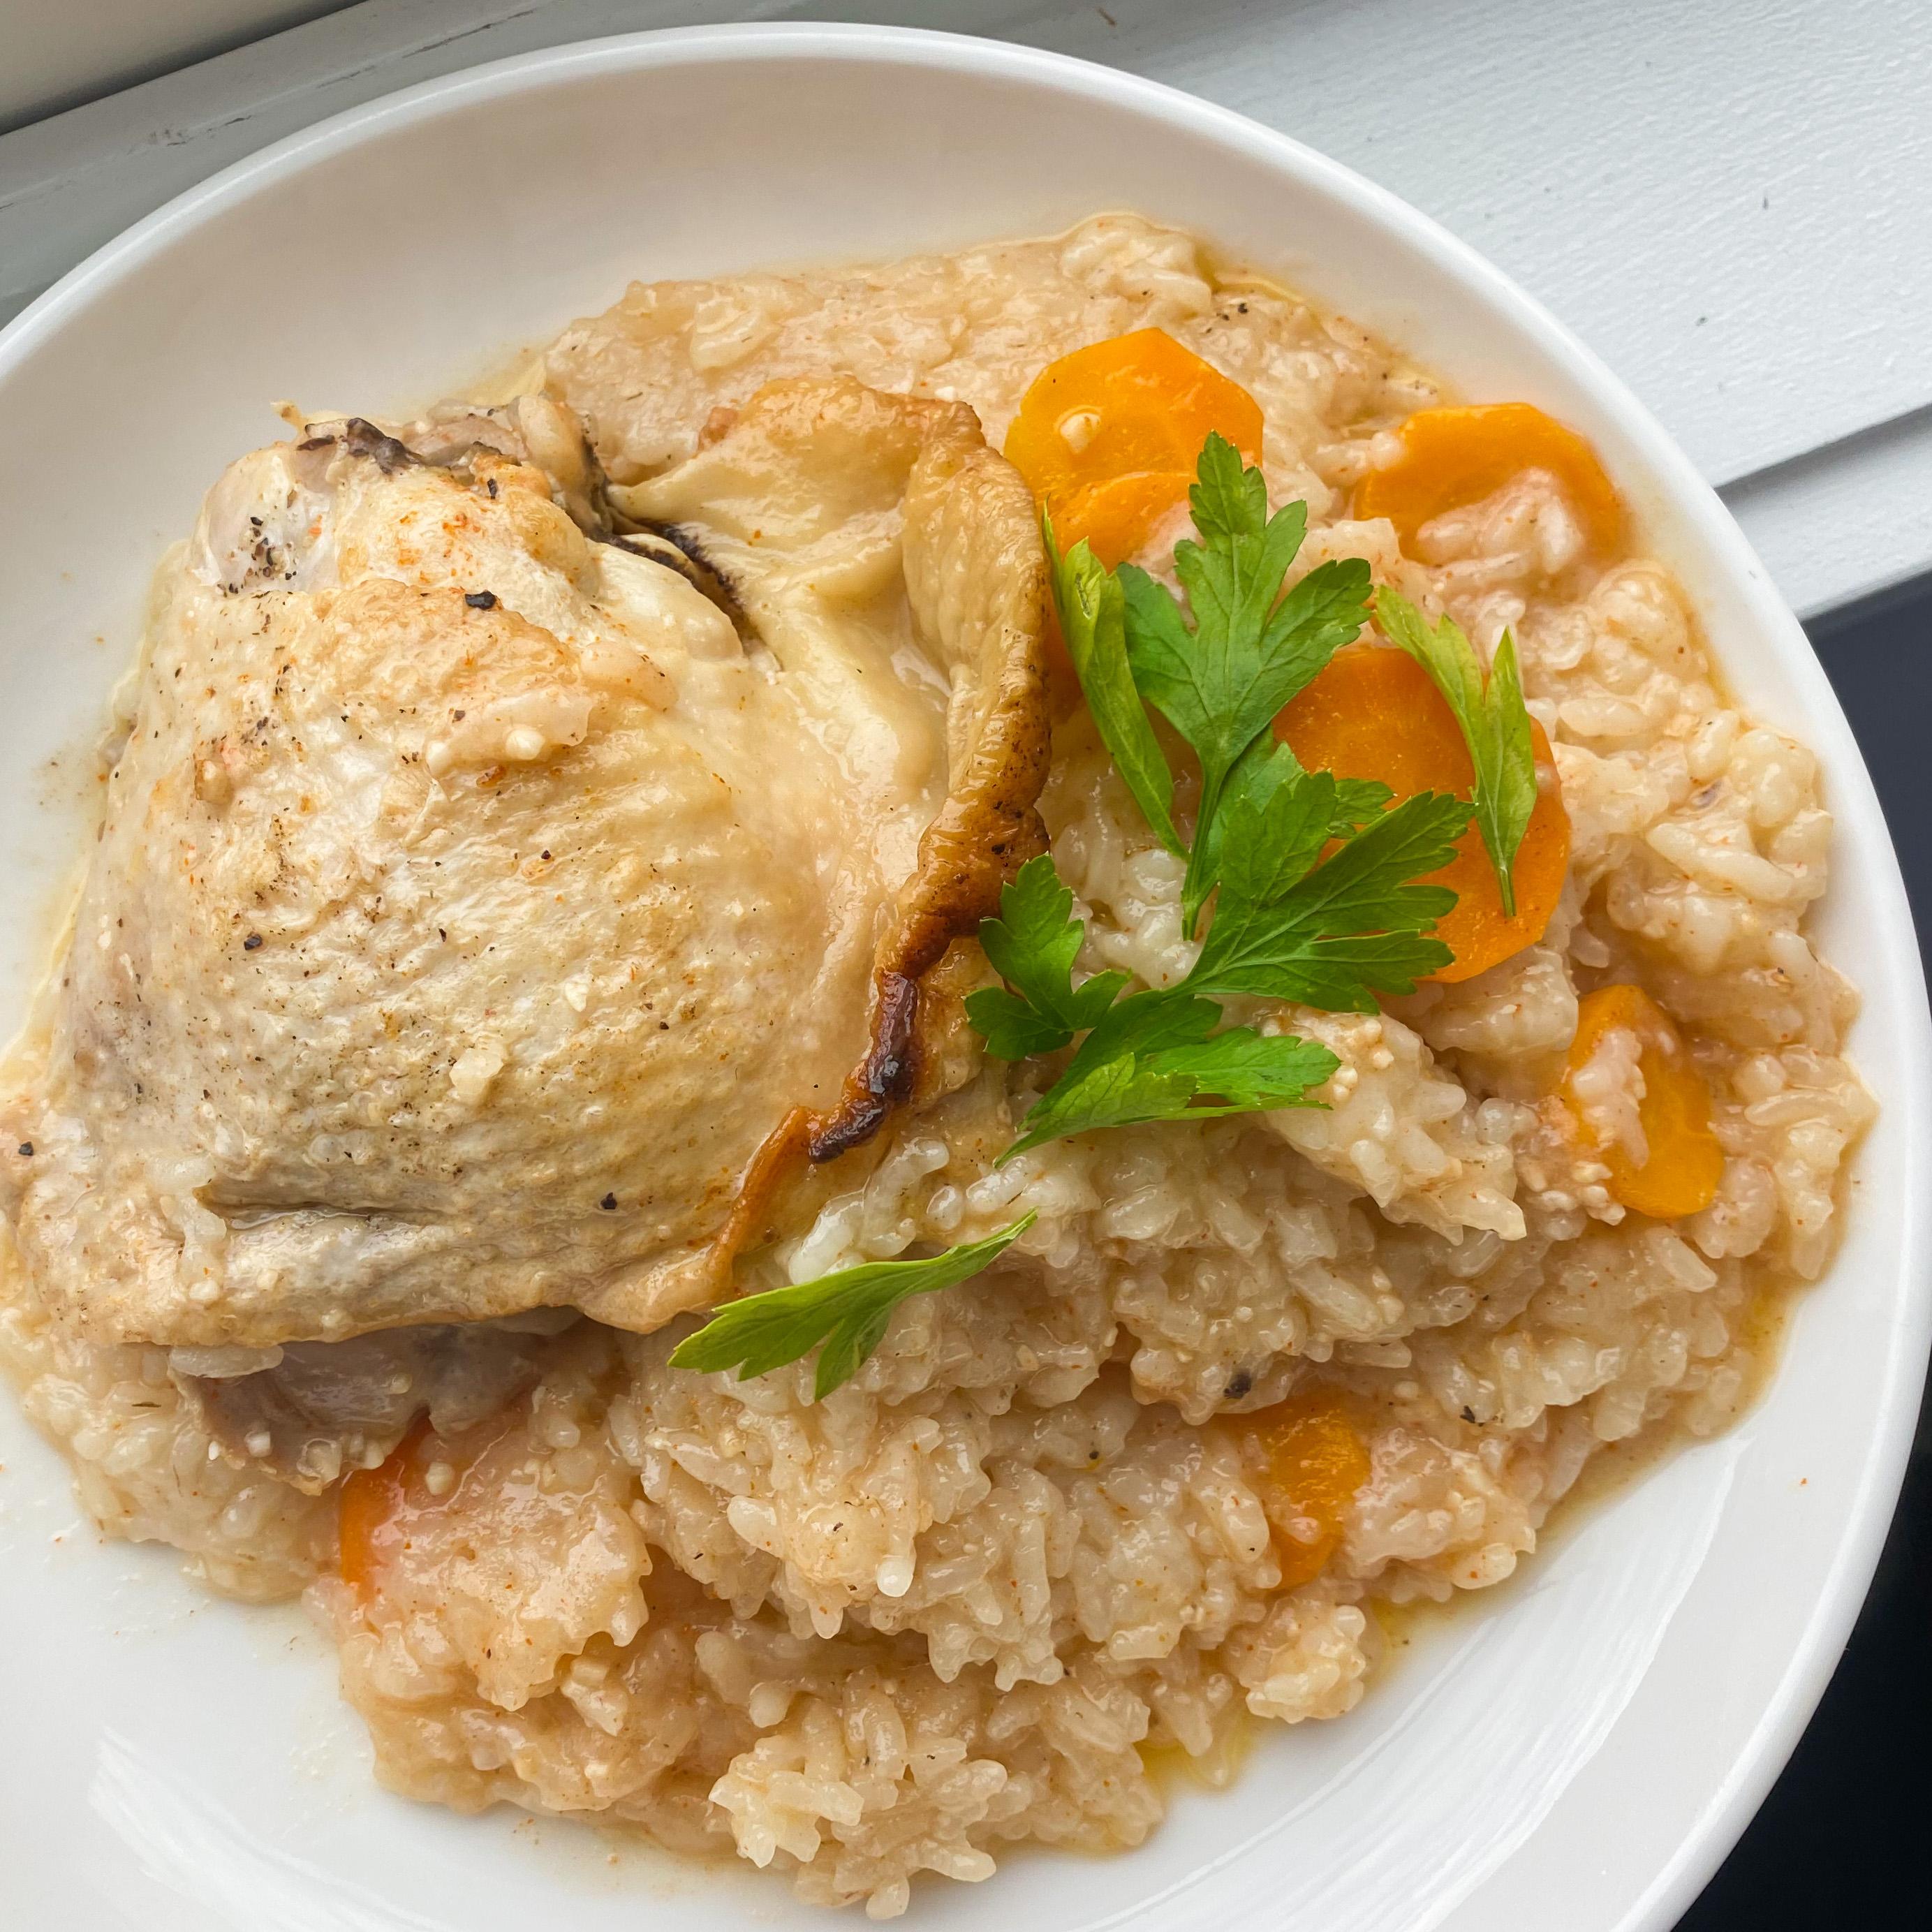 Slow Cooker Lemon-Garlic Chicken and Rice